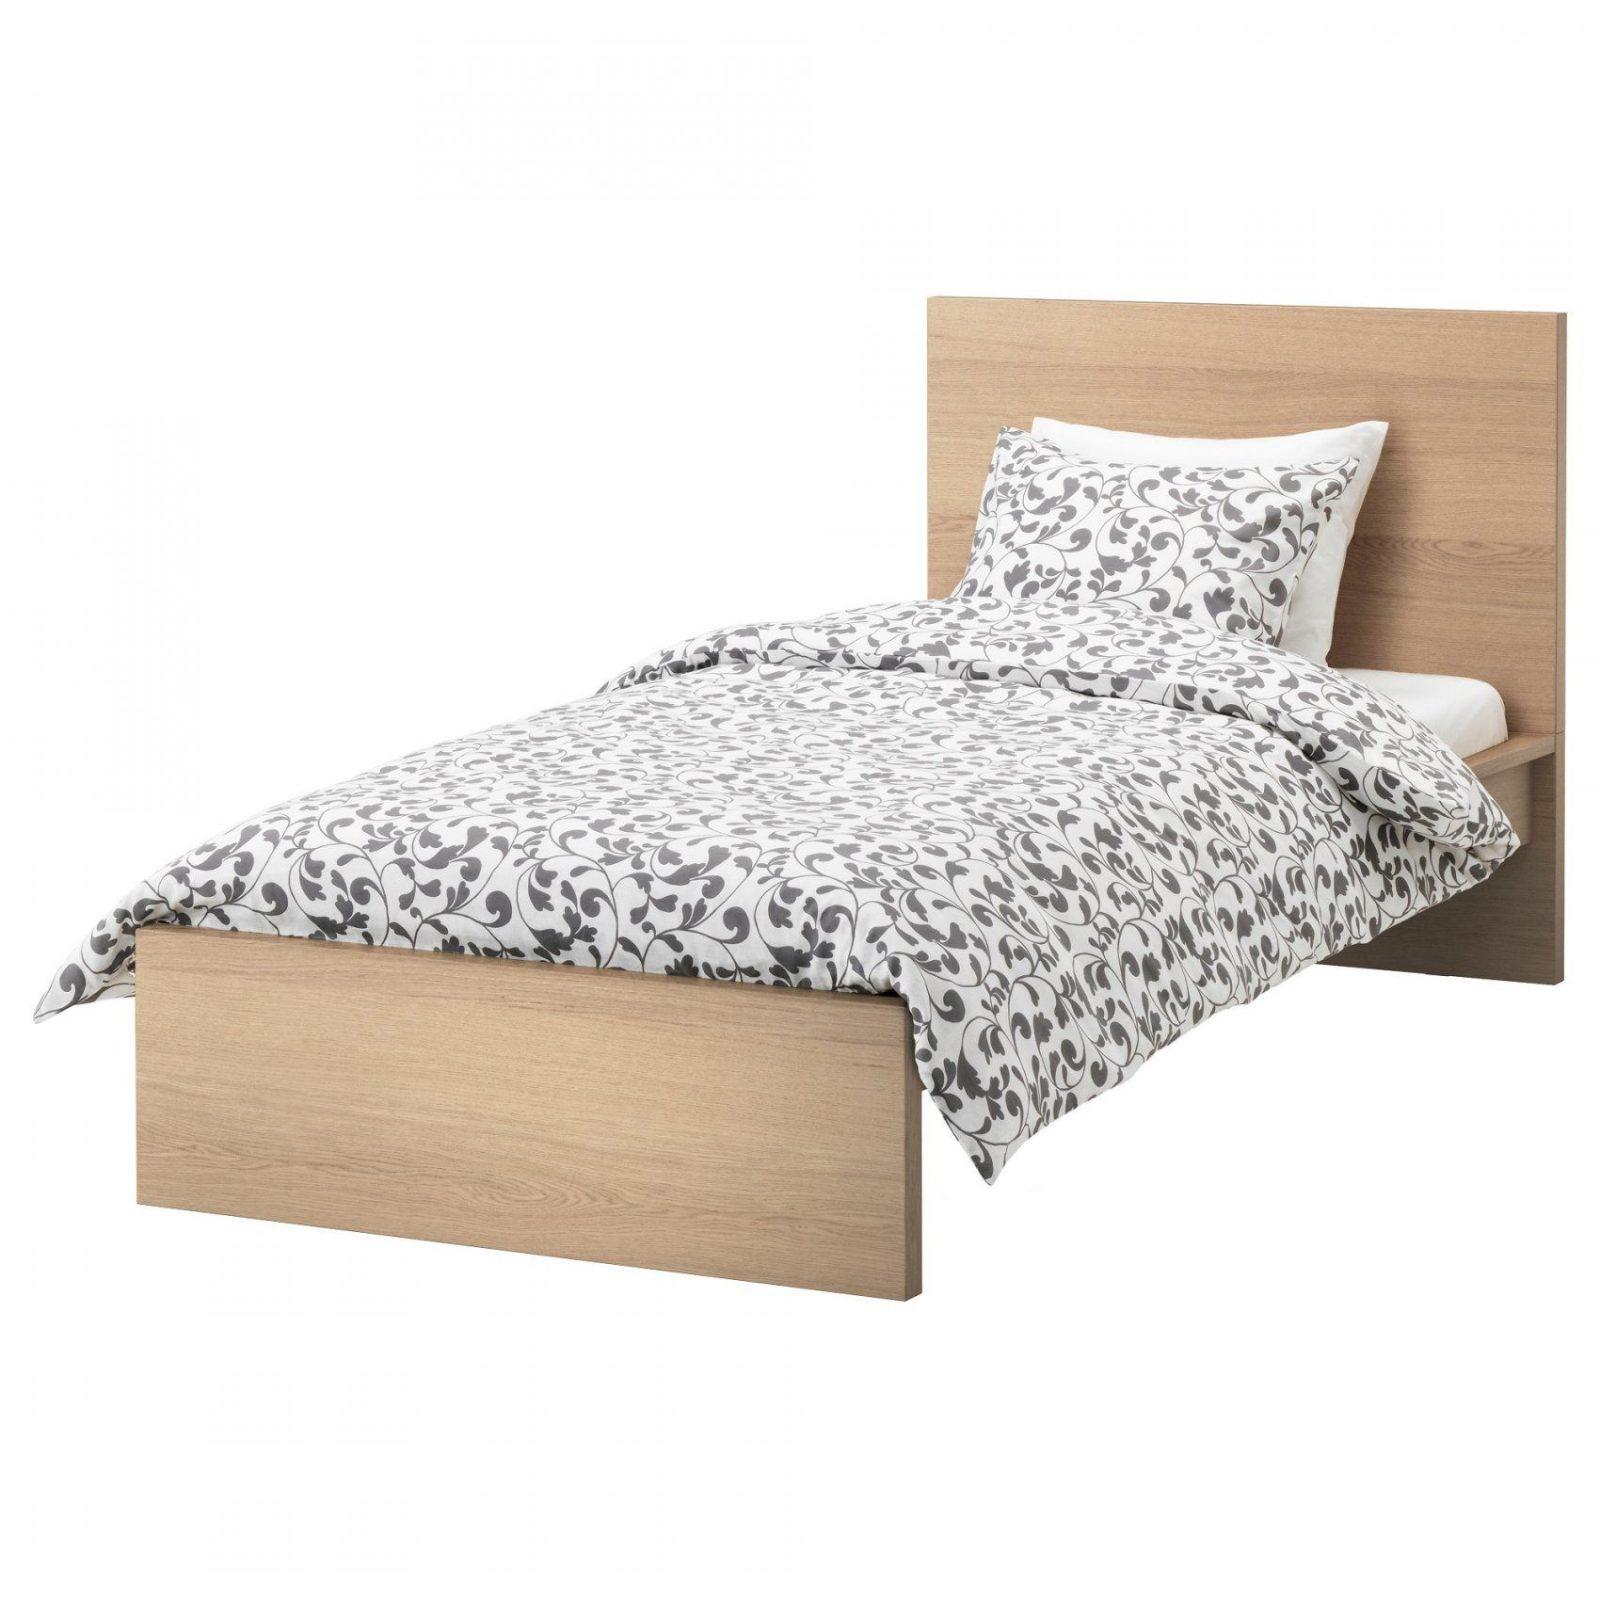 Malm Bedonderstel Hoog  Wit  Ikea von Ikea Malm Bett 100X200 Bild